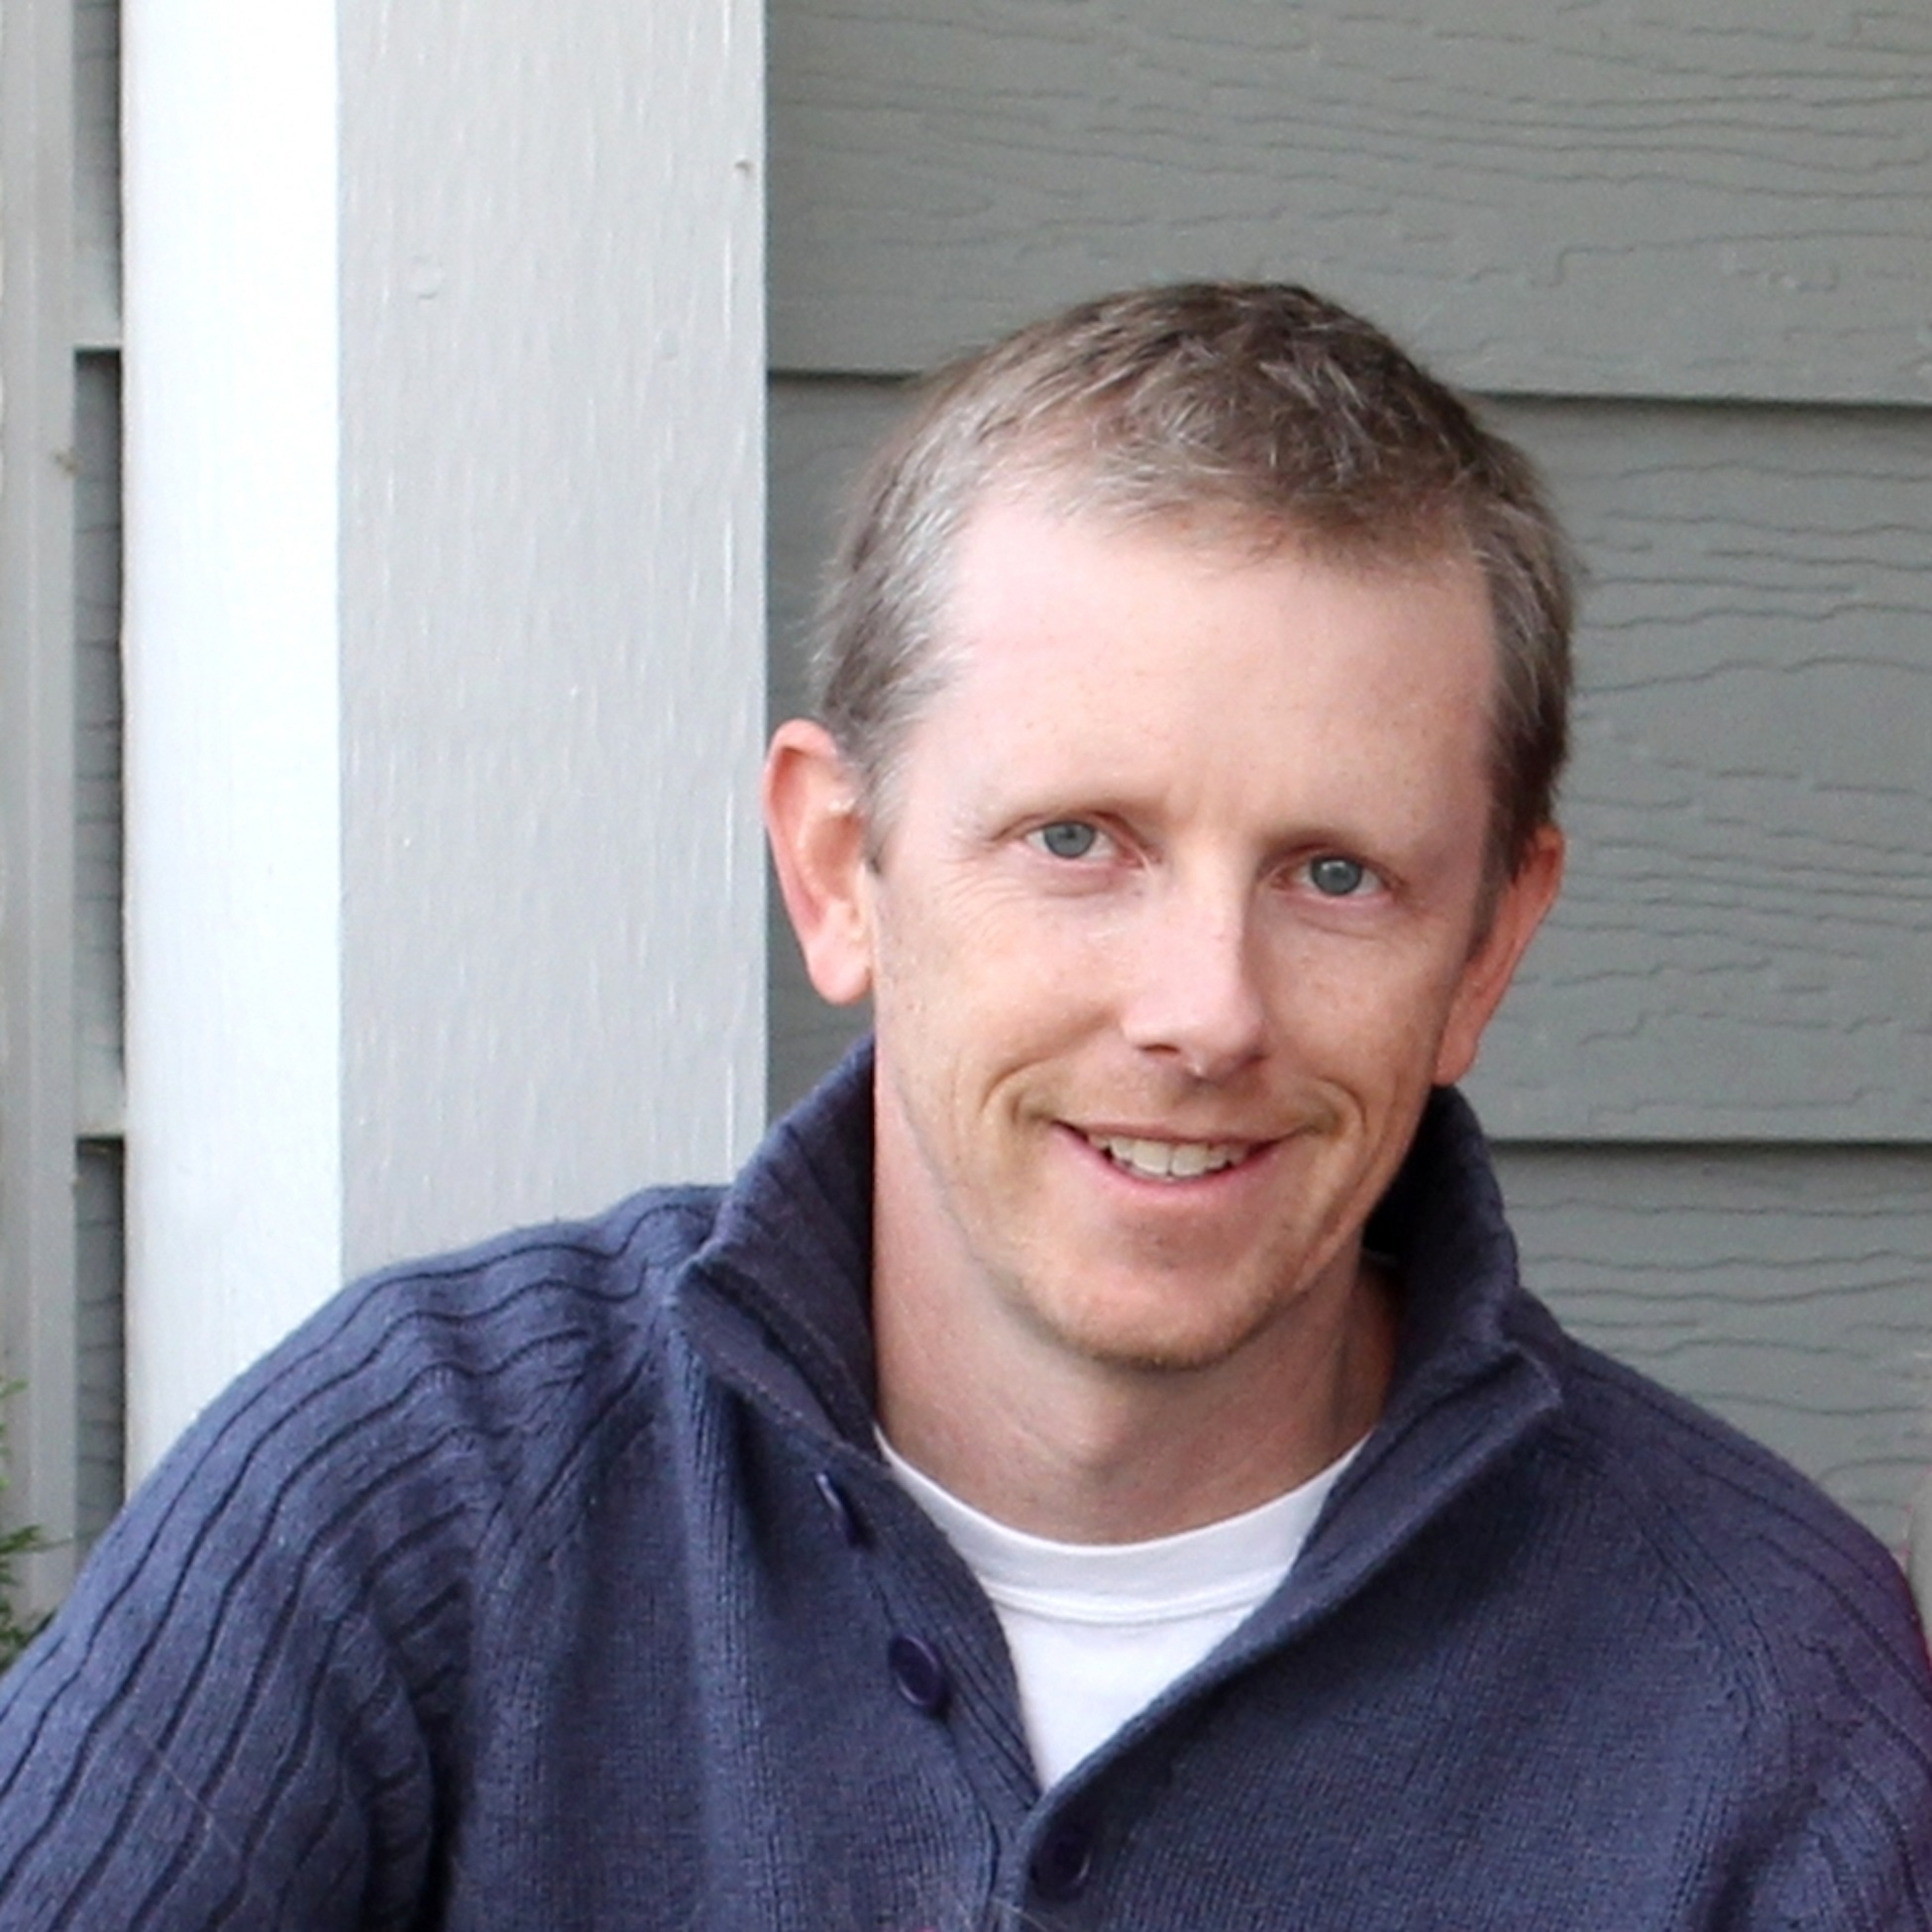 Brian Alferman - Johnson County Director of Sustainability